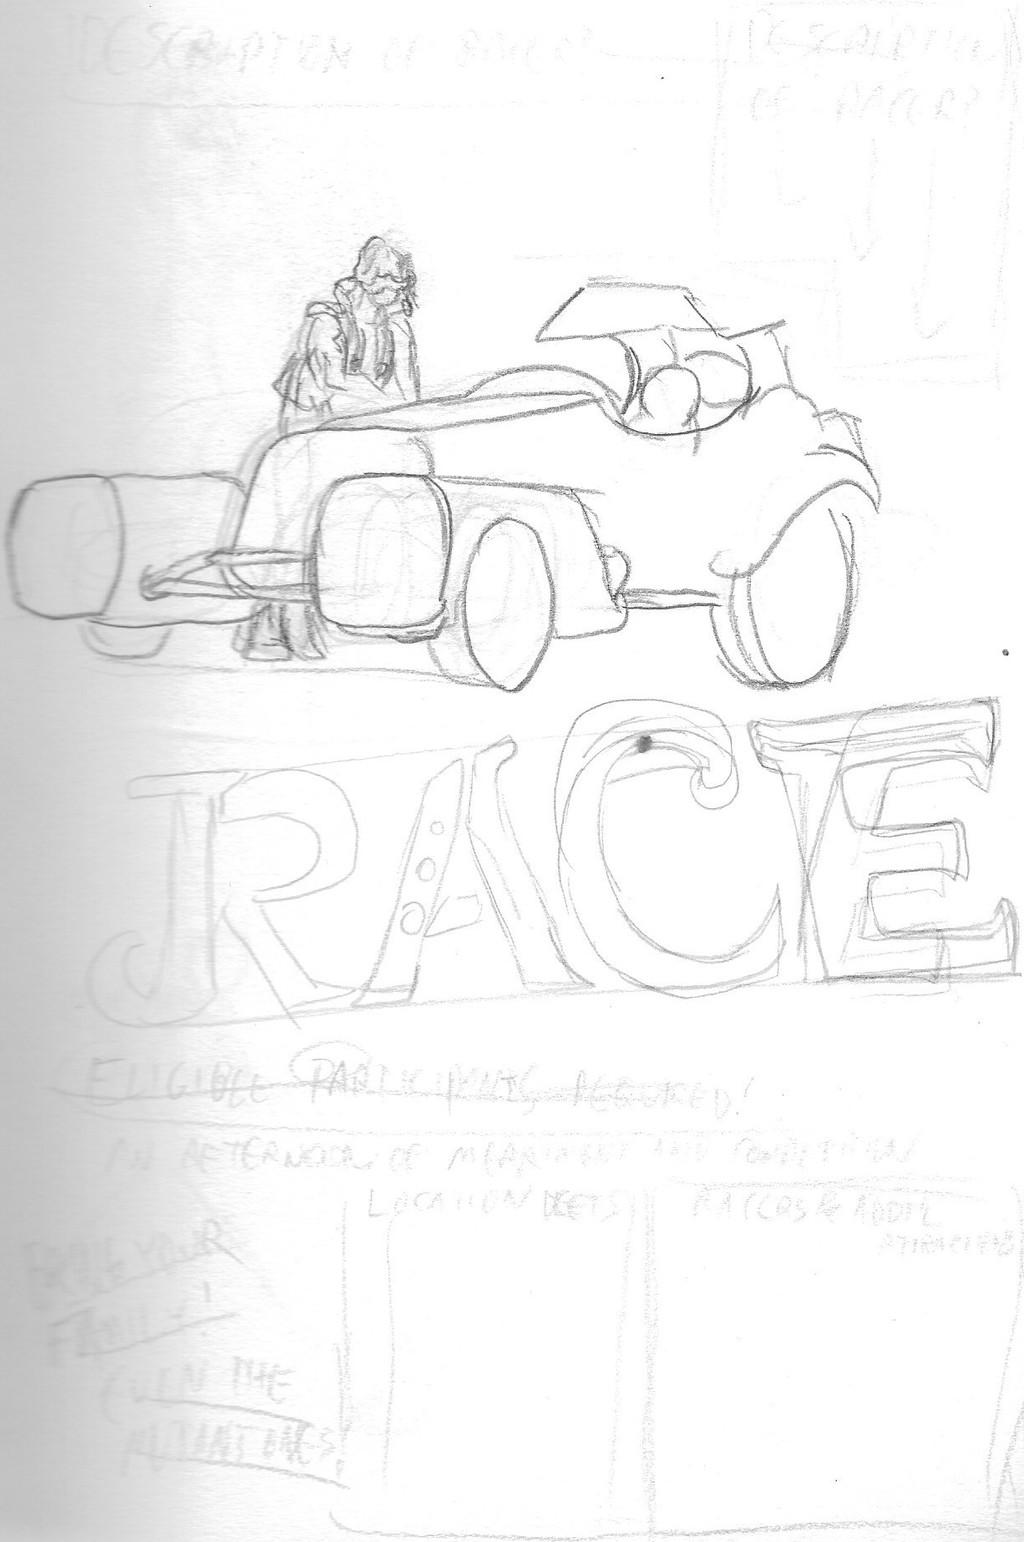 Auriga 18 Race Poster (draft)